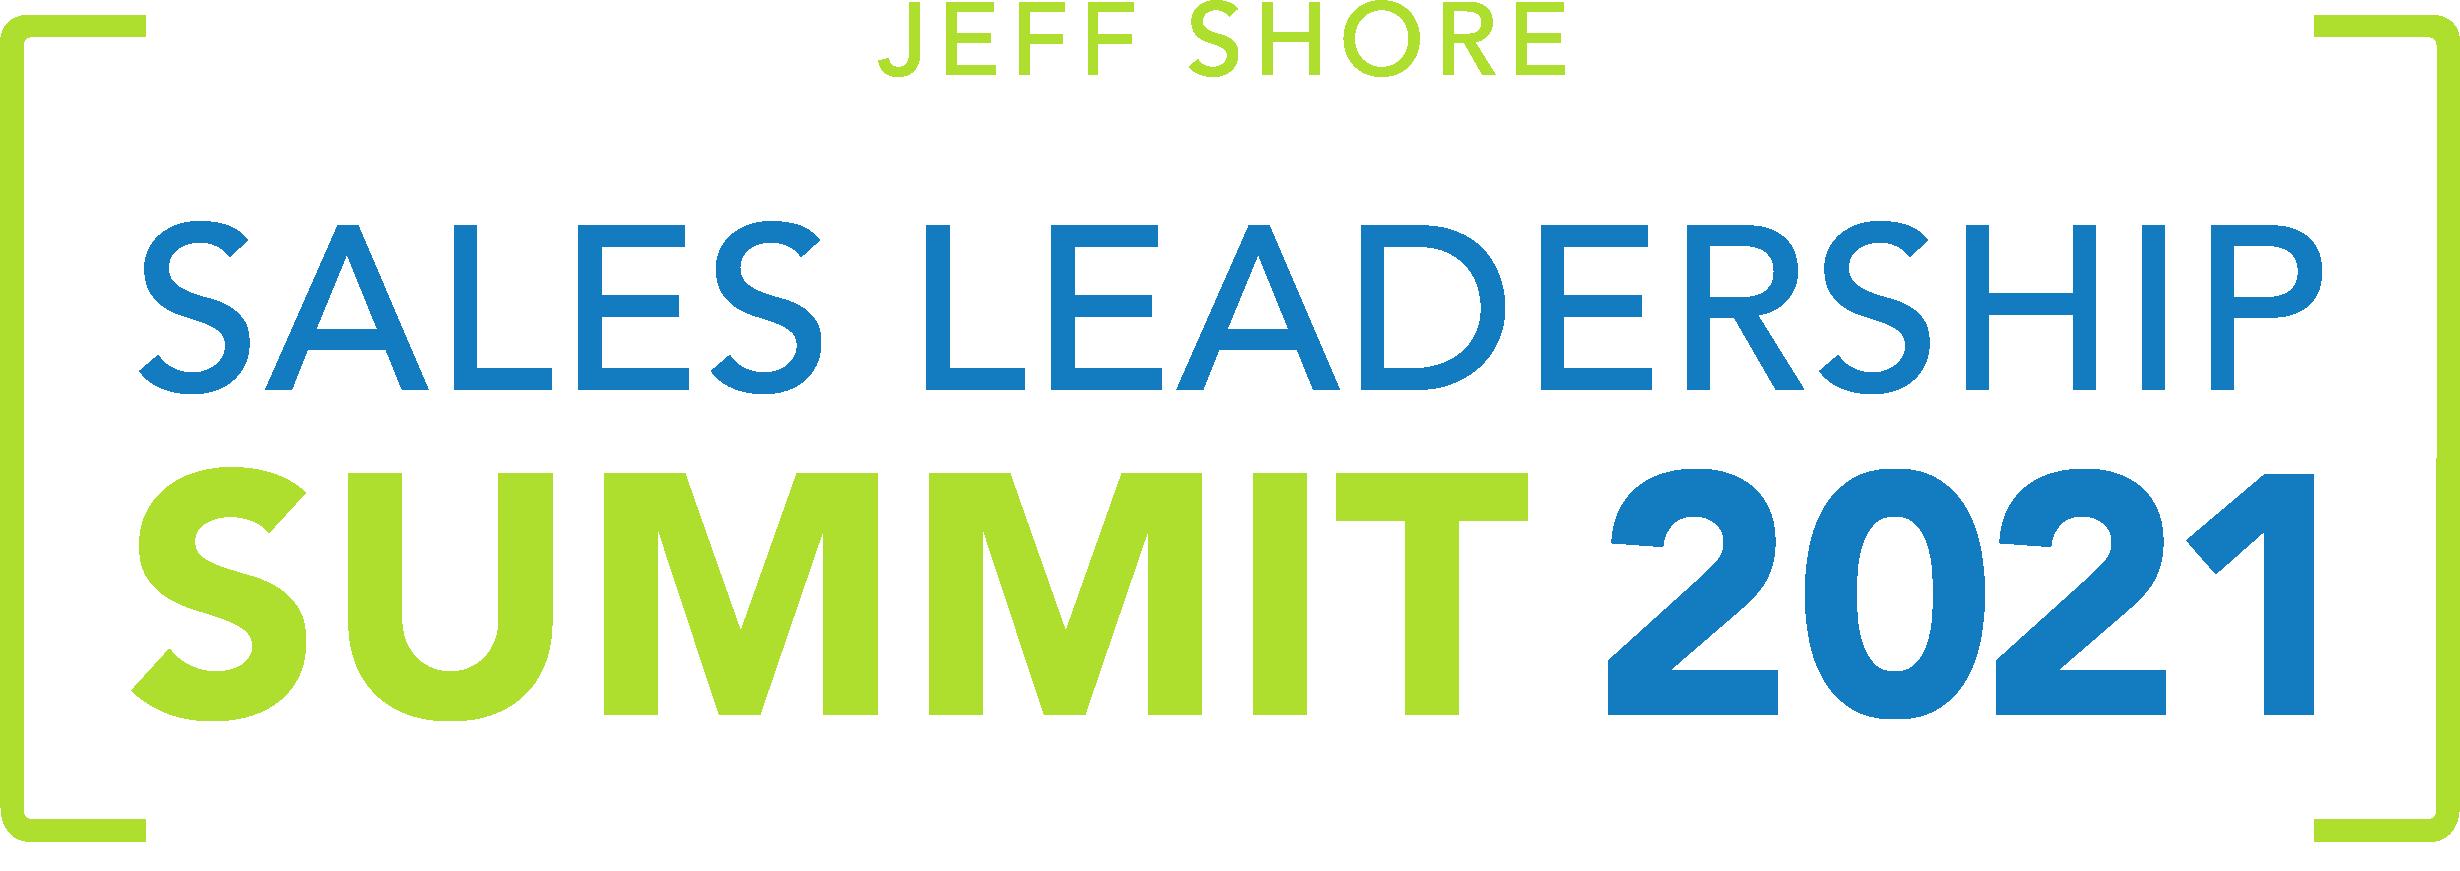 Jeff Shore's Sales Leadership Summit